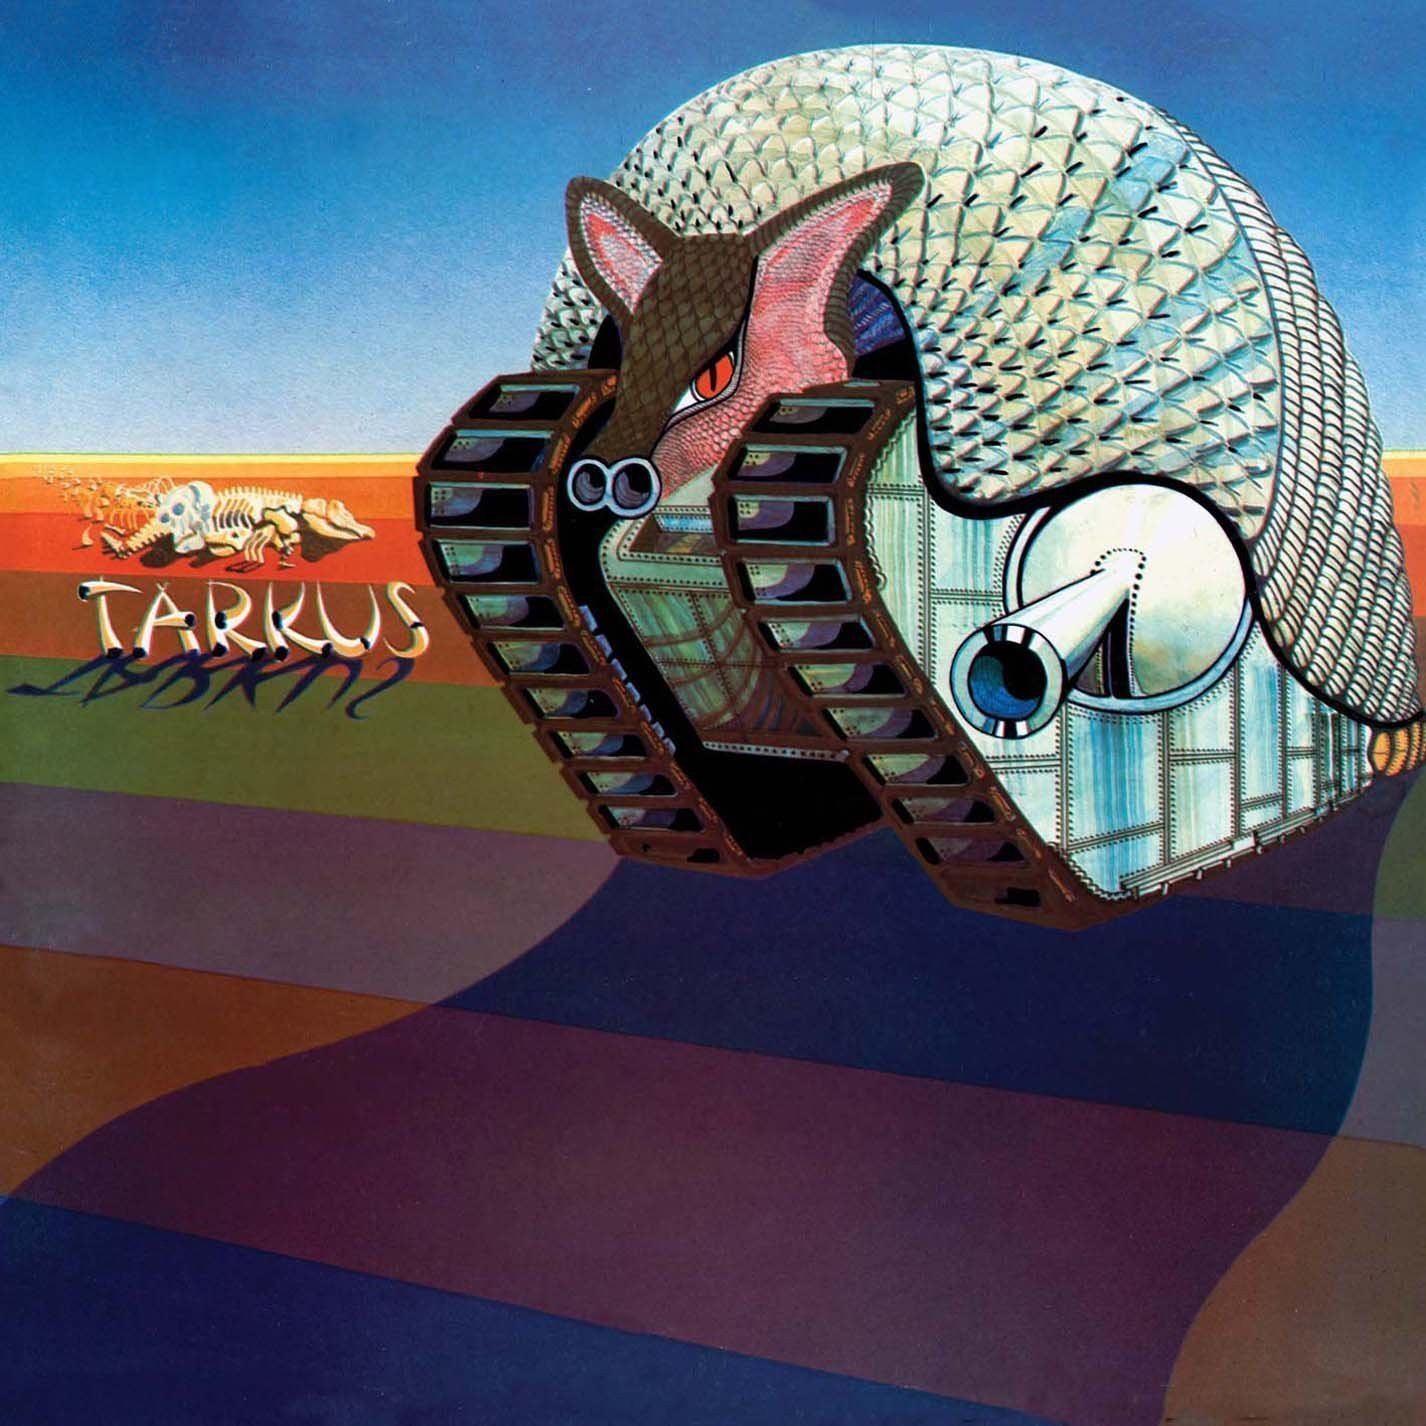 Copertina Disco Vinile 33 giri Tarkus di Emerson, Lake & Palmer